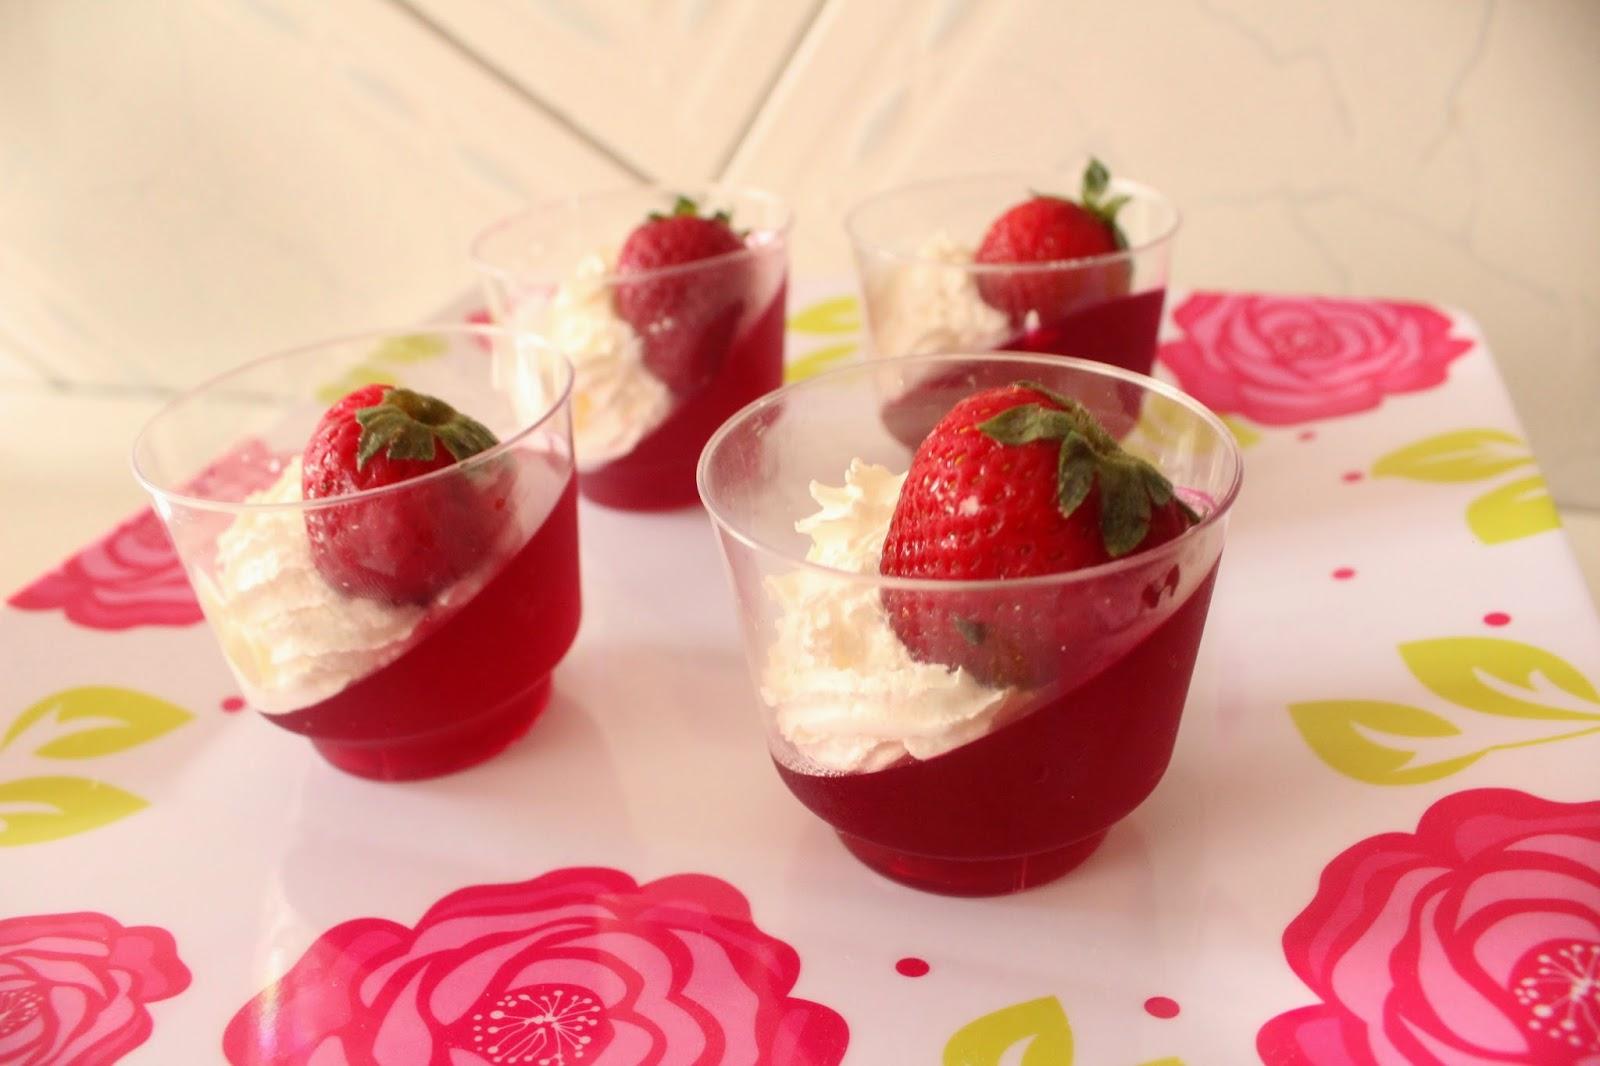 gelatina especial para natal